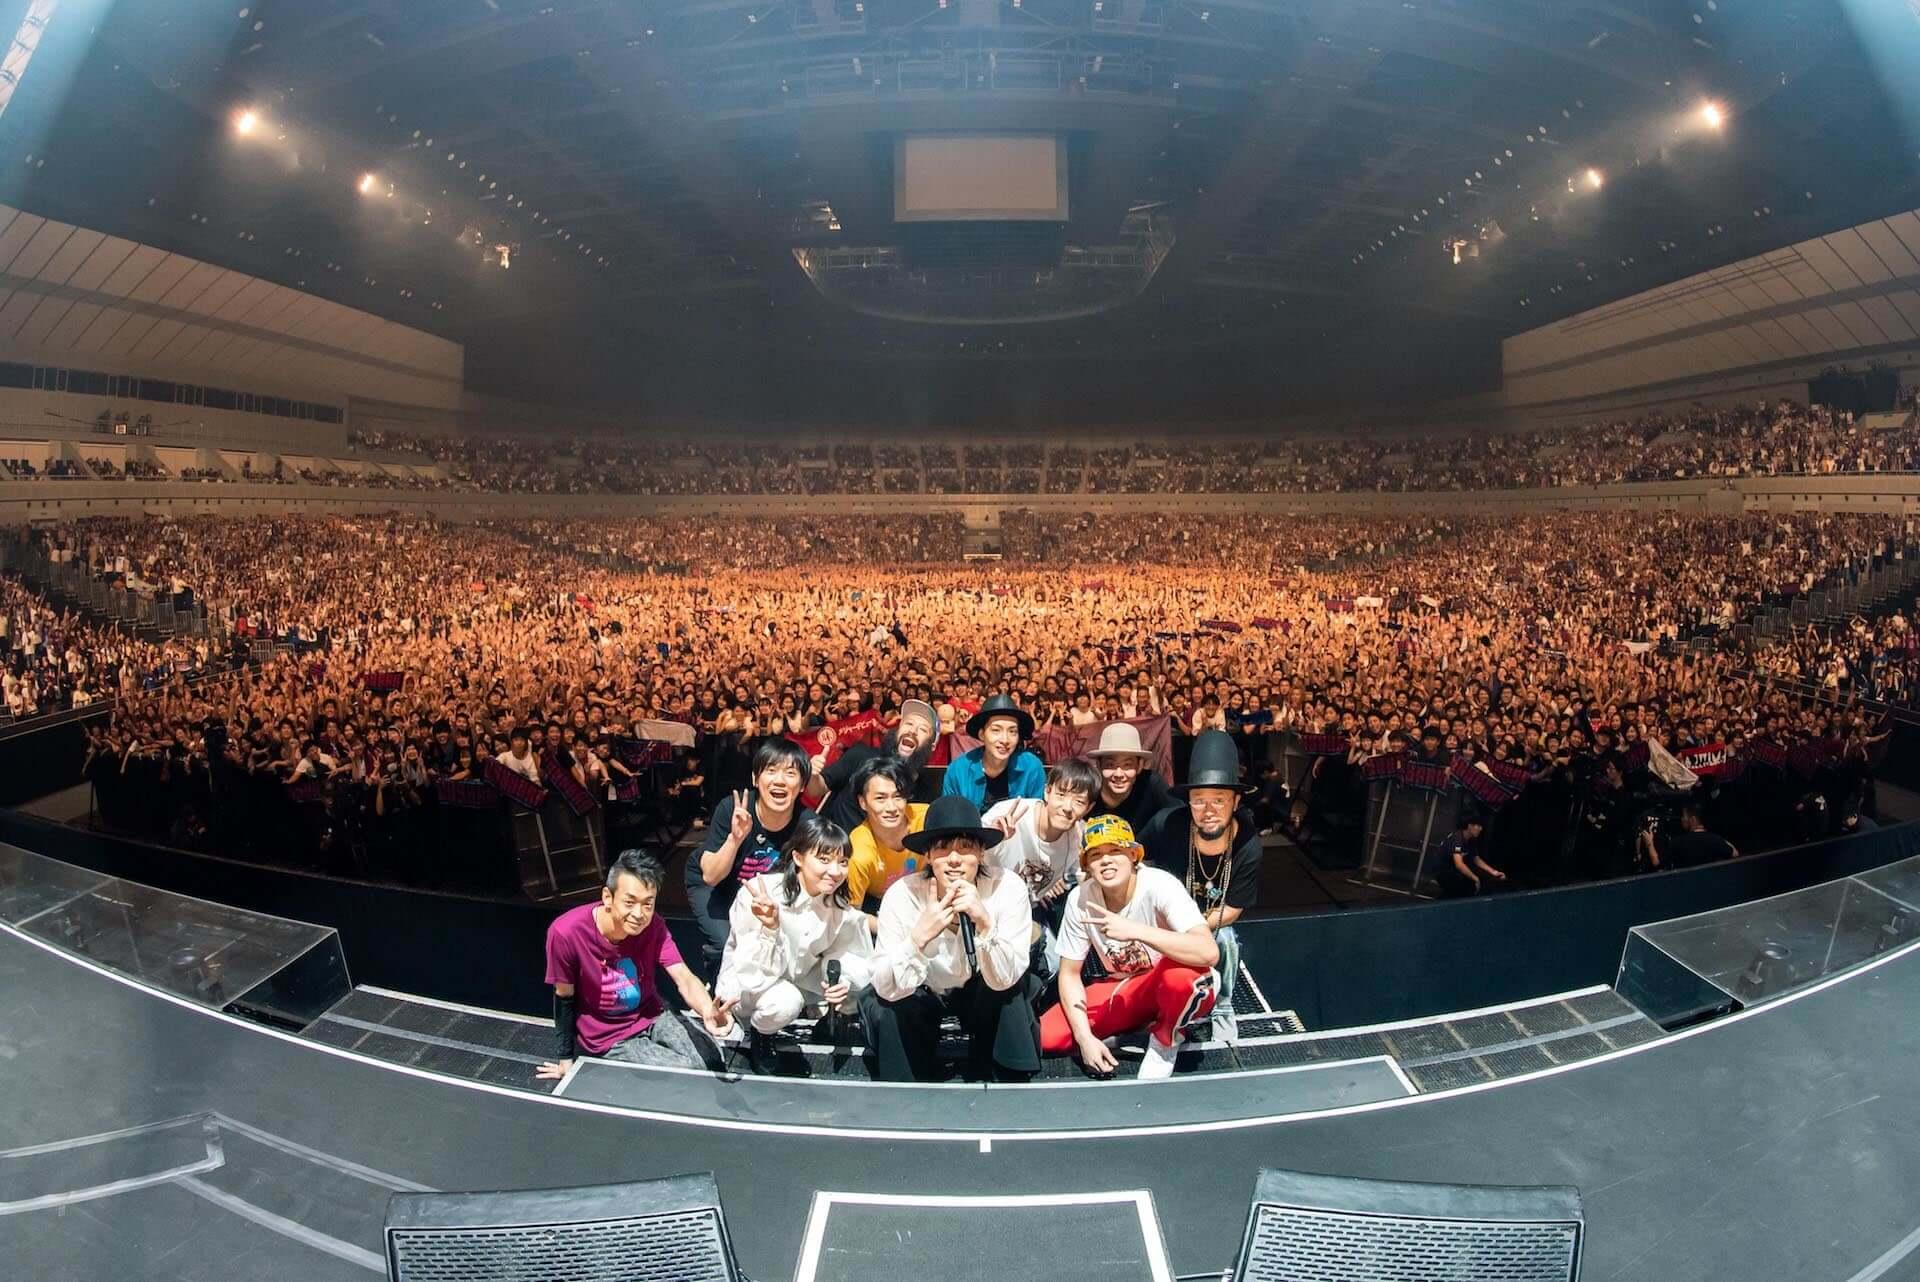 RADWIMPS横浜アリーナ公演のライブ写真が公開!<ANTI ANTI GENERATION TOUR 2019>レポート music190830_radwimps_live_2-1920x1282